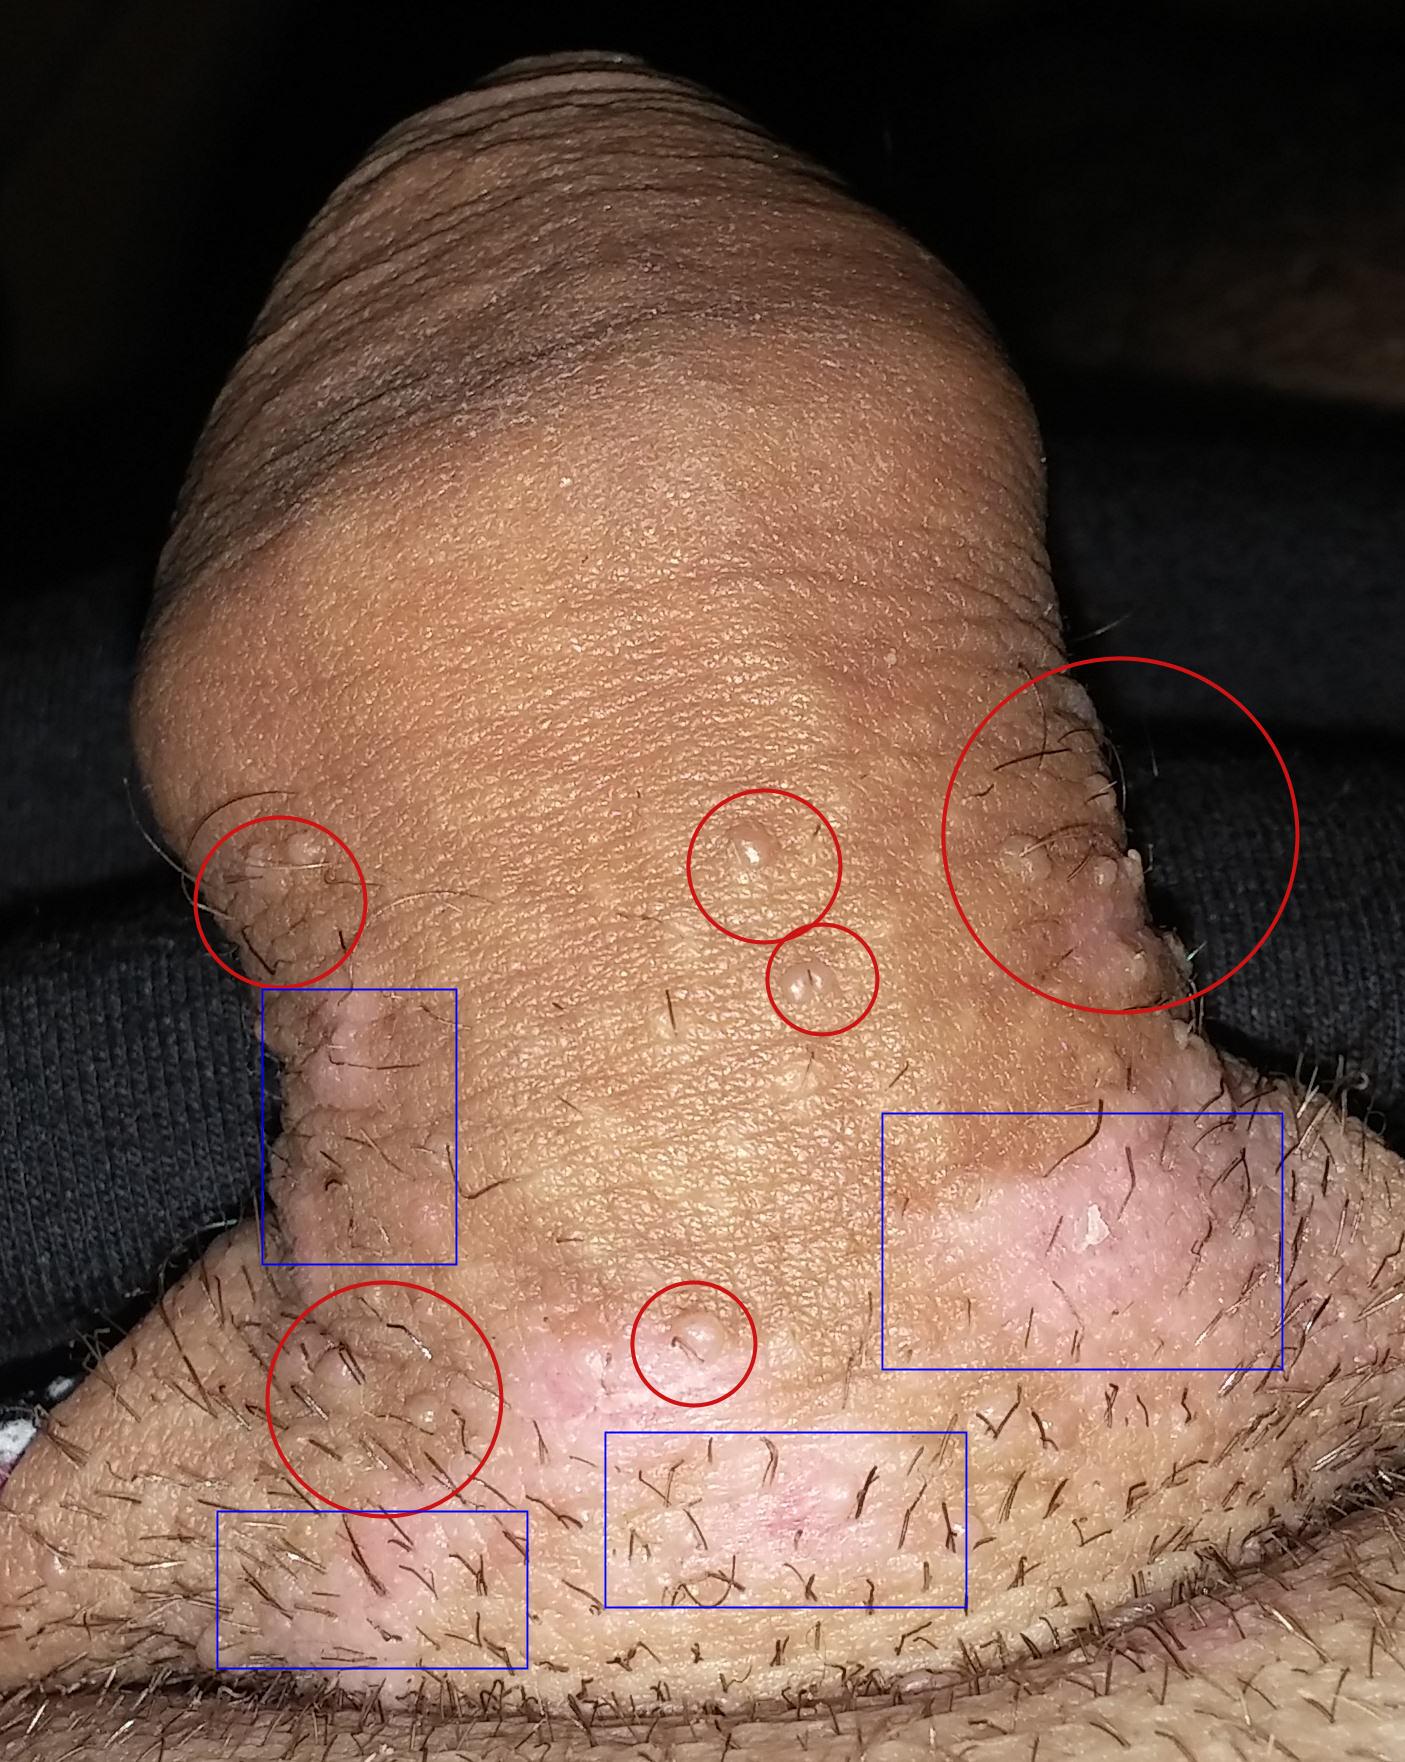 Comment depister papillomavirus chez lhomme, Recherche de papillomavirus chez l homme